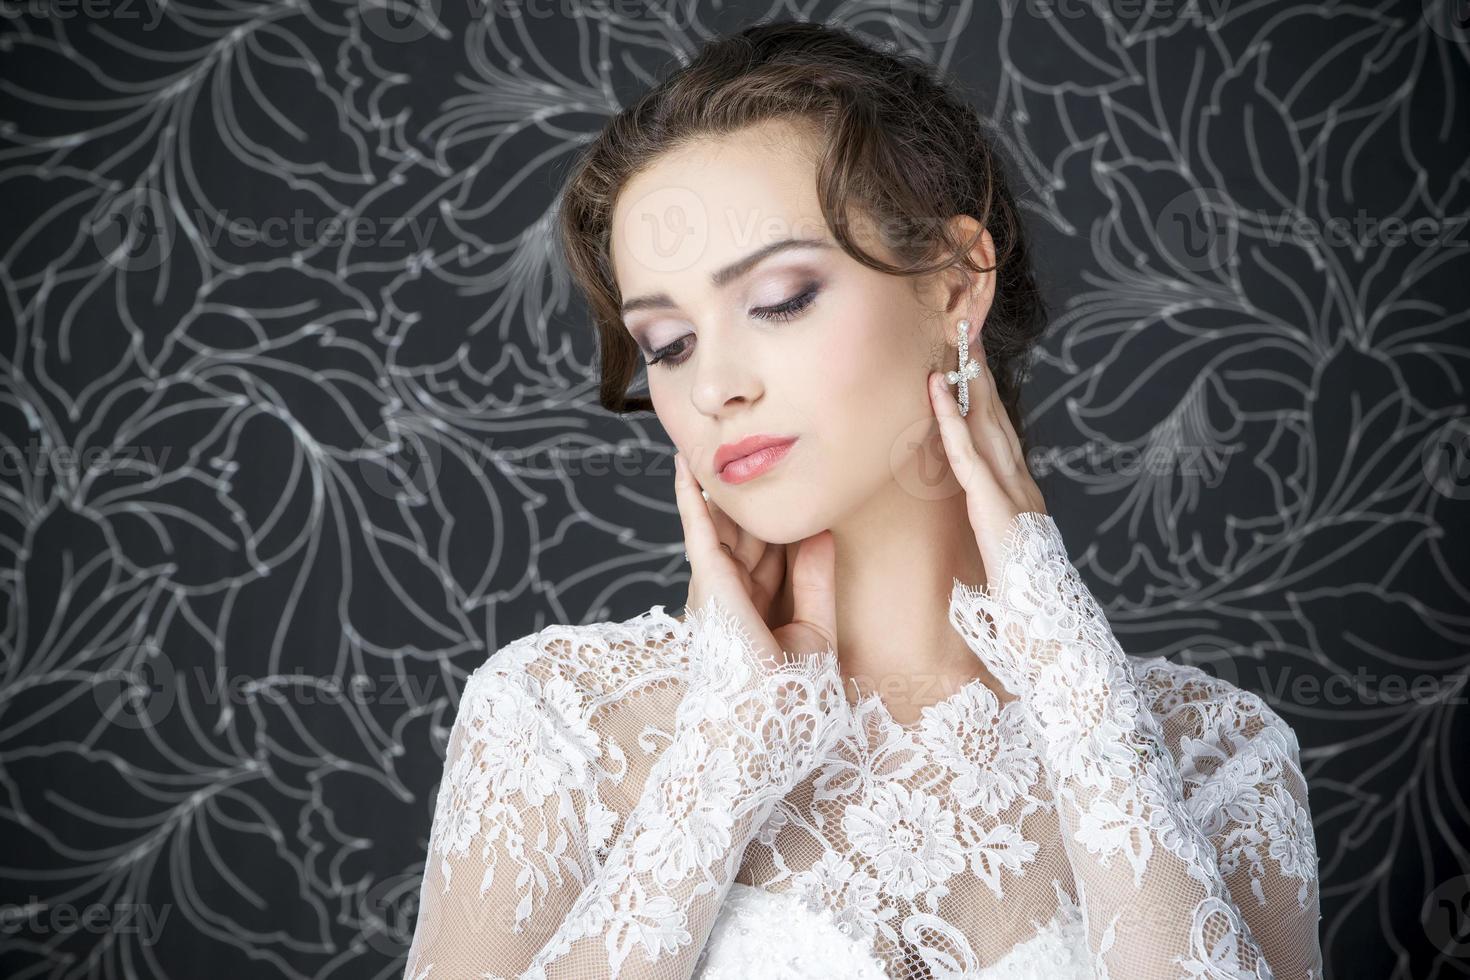 professionele make-up kapsel bruid foto